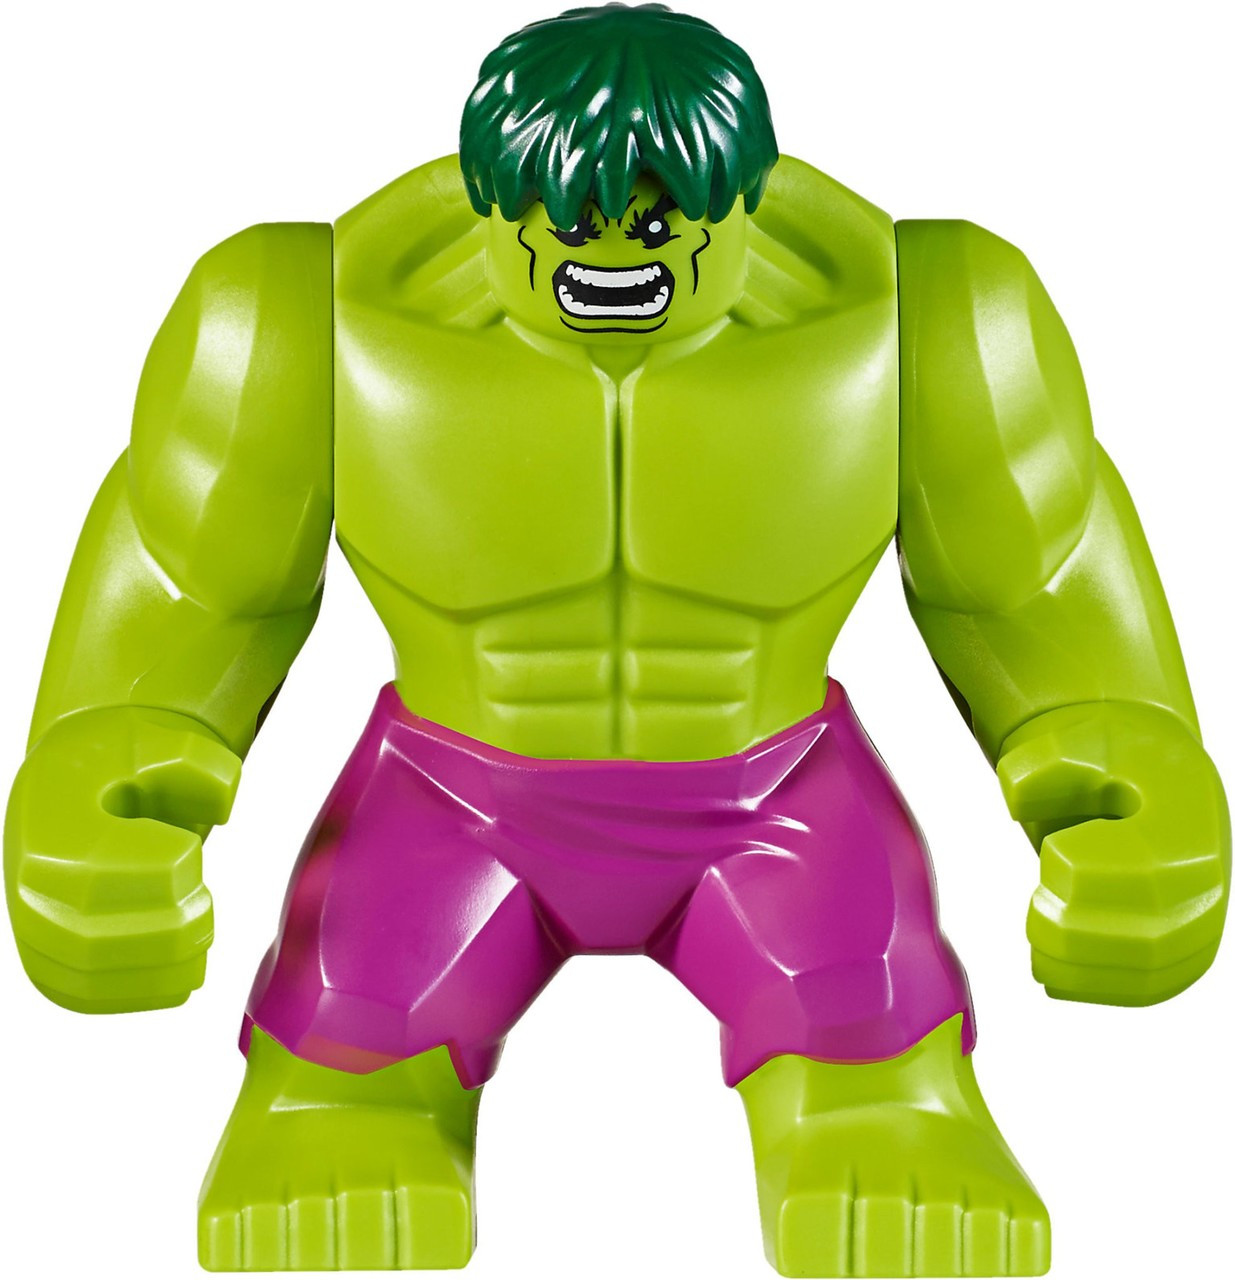 Marvel Super Heroes Incredible Hulk 2 Mini Figure Avengers,Spiderman Fit lego